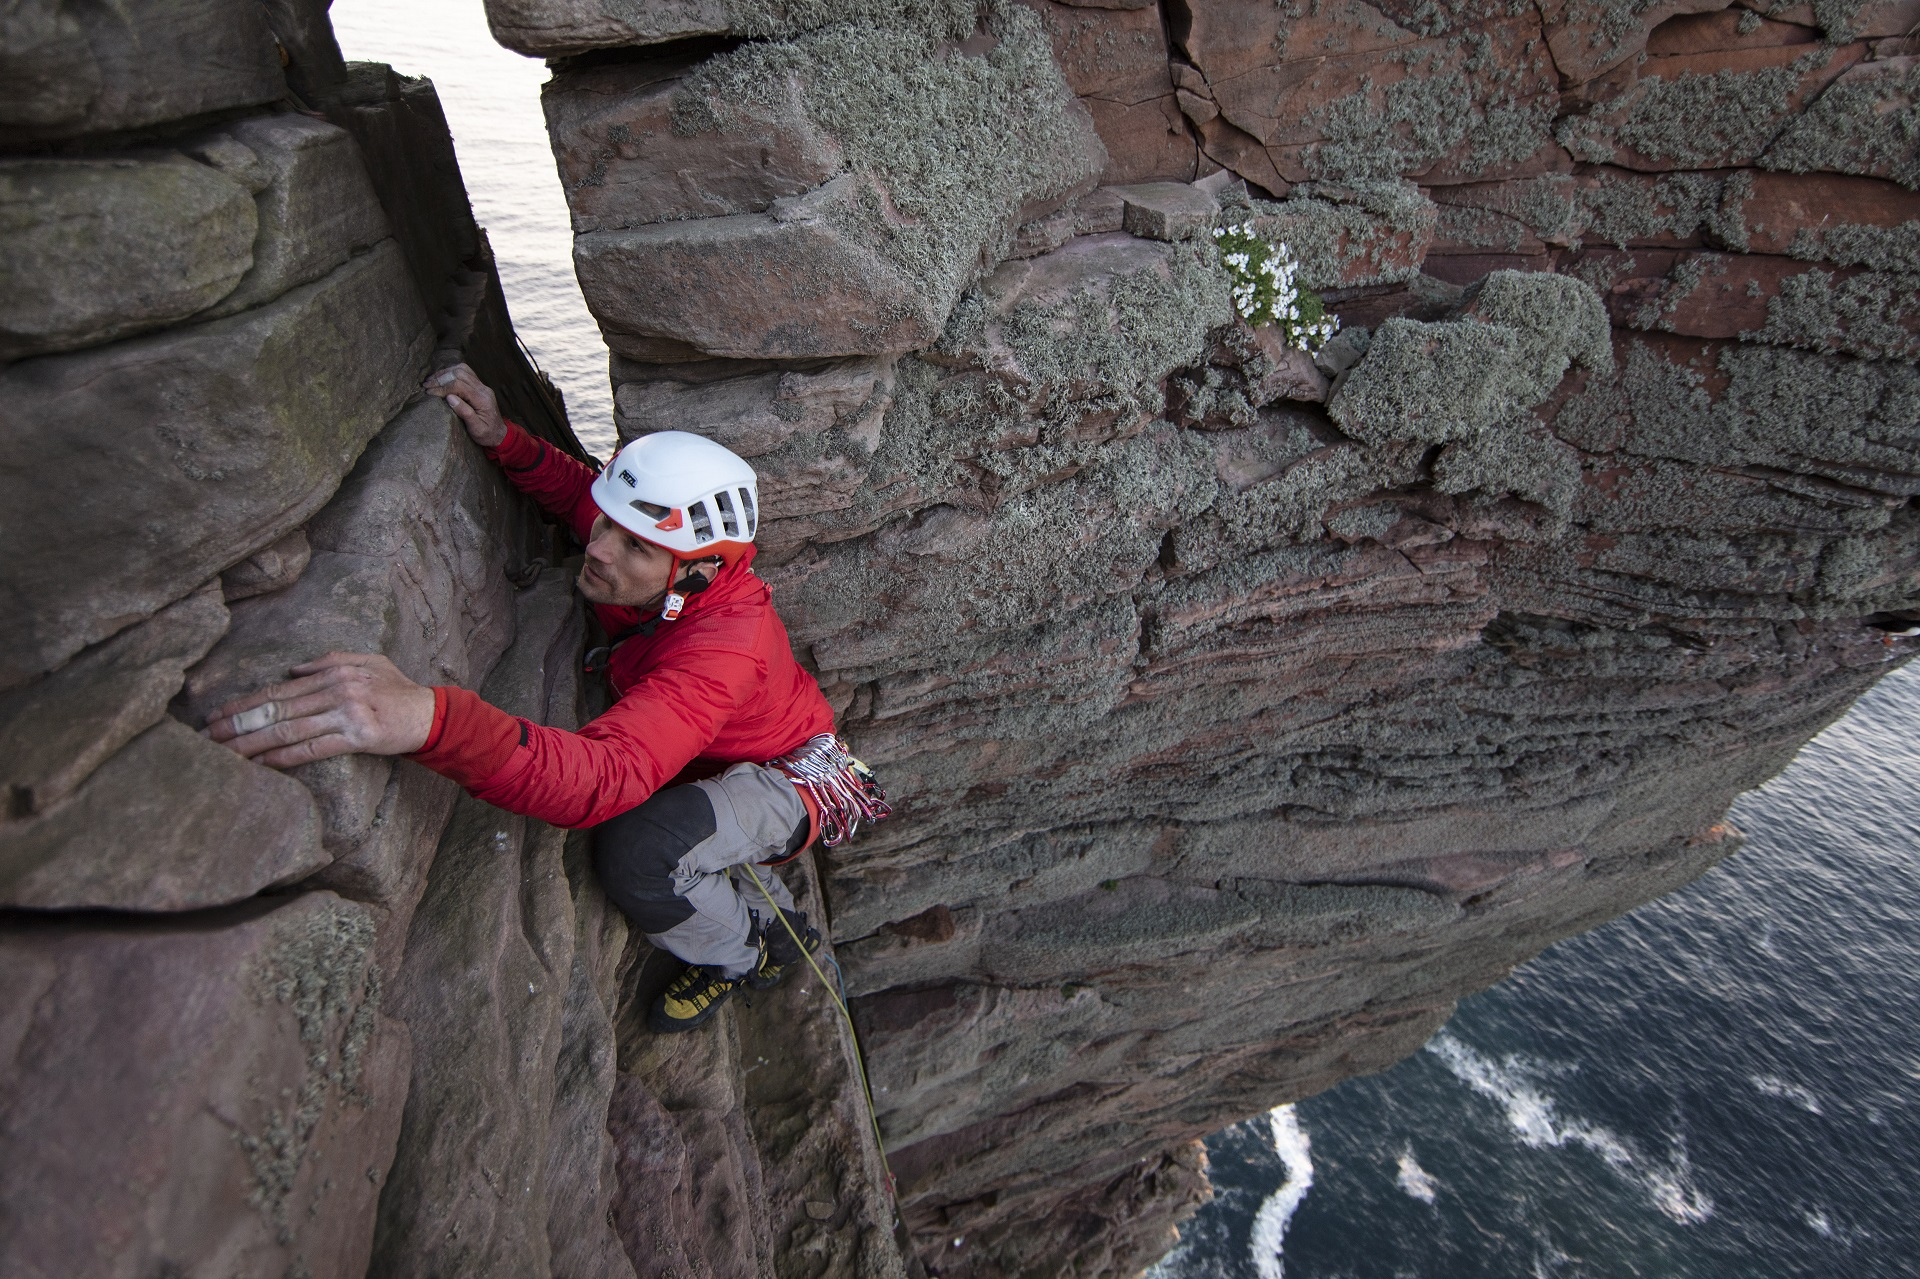 Climbing Blind - Jesse arrive au sommet